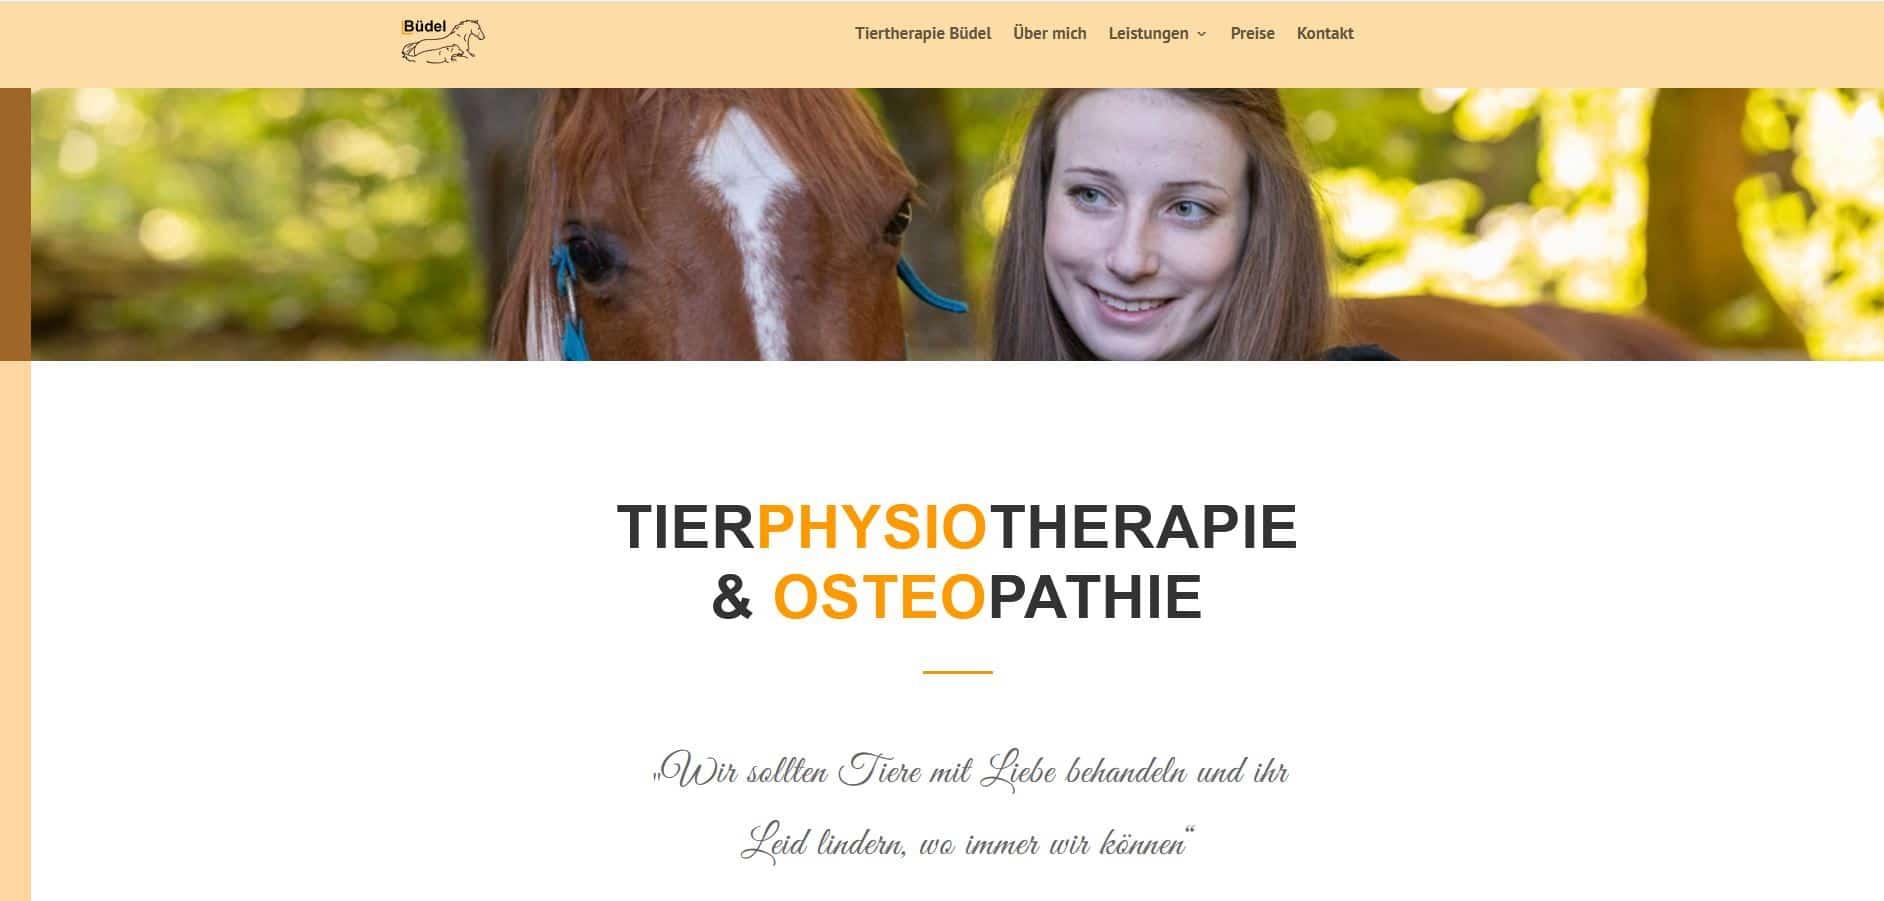 Lea Büdel Tiertherapie